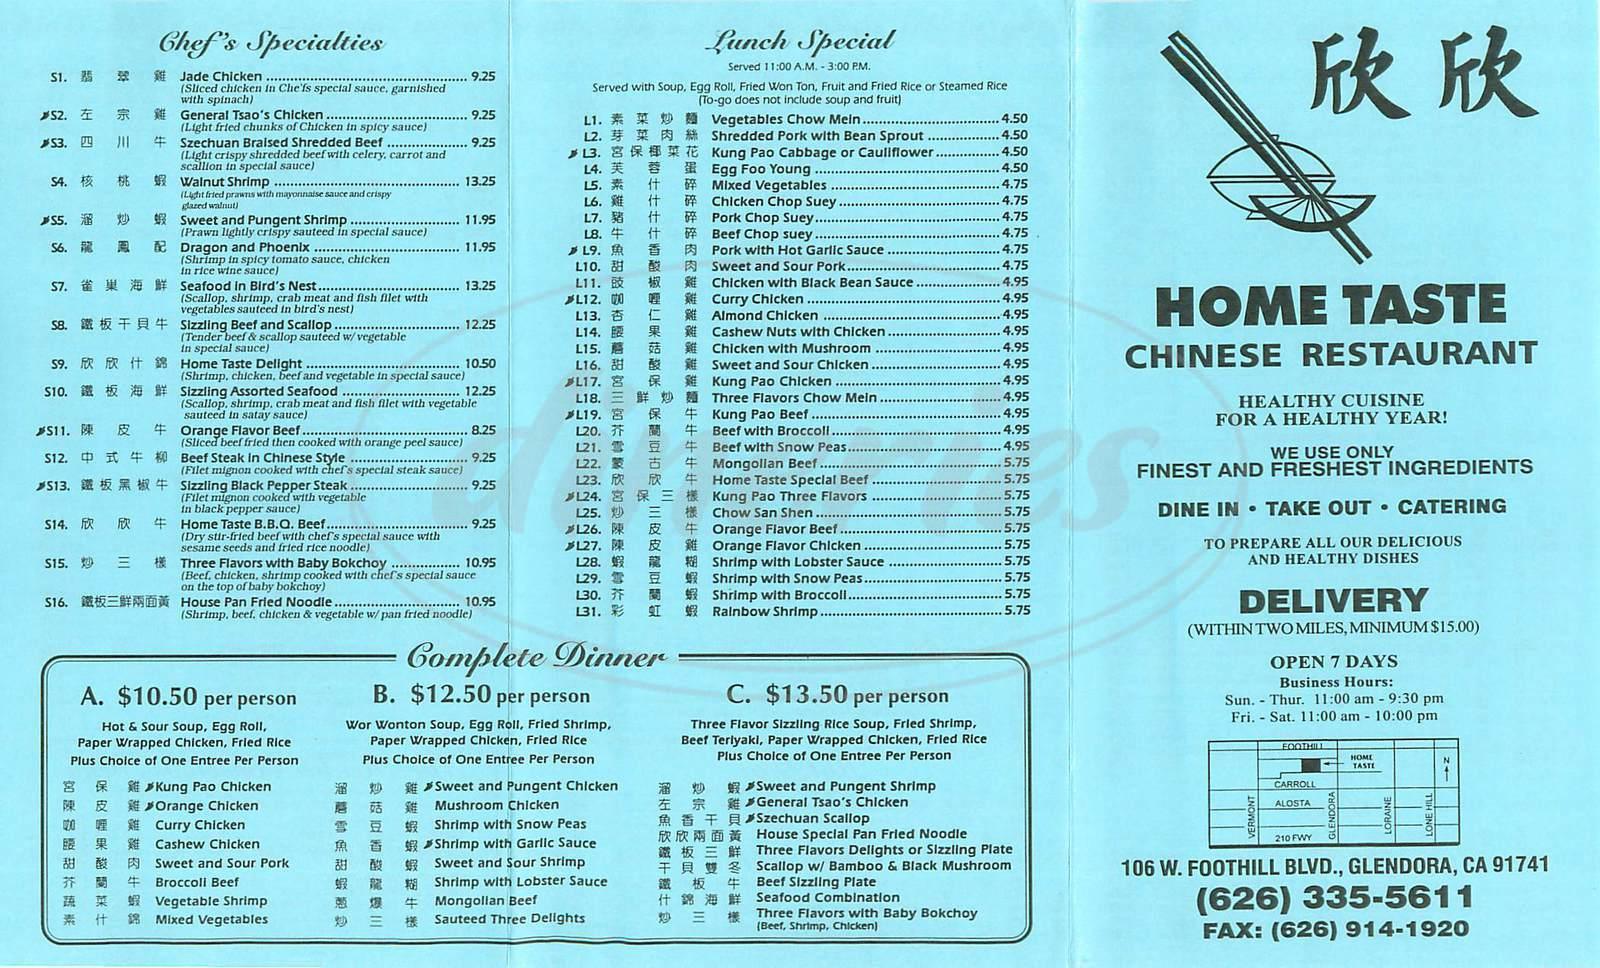 menu for Home Taste